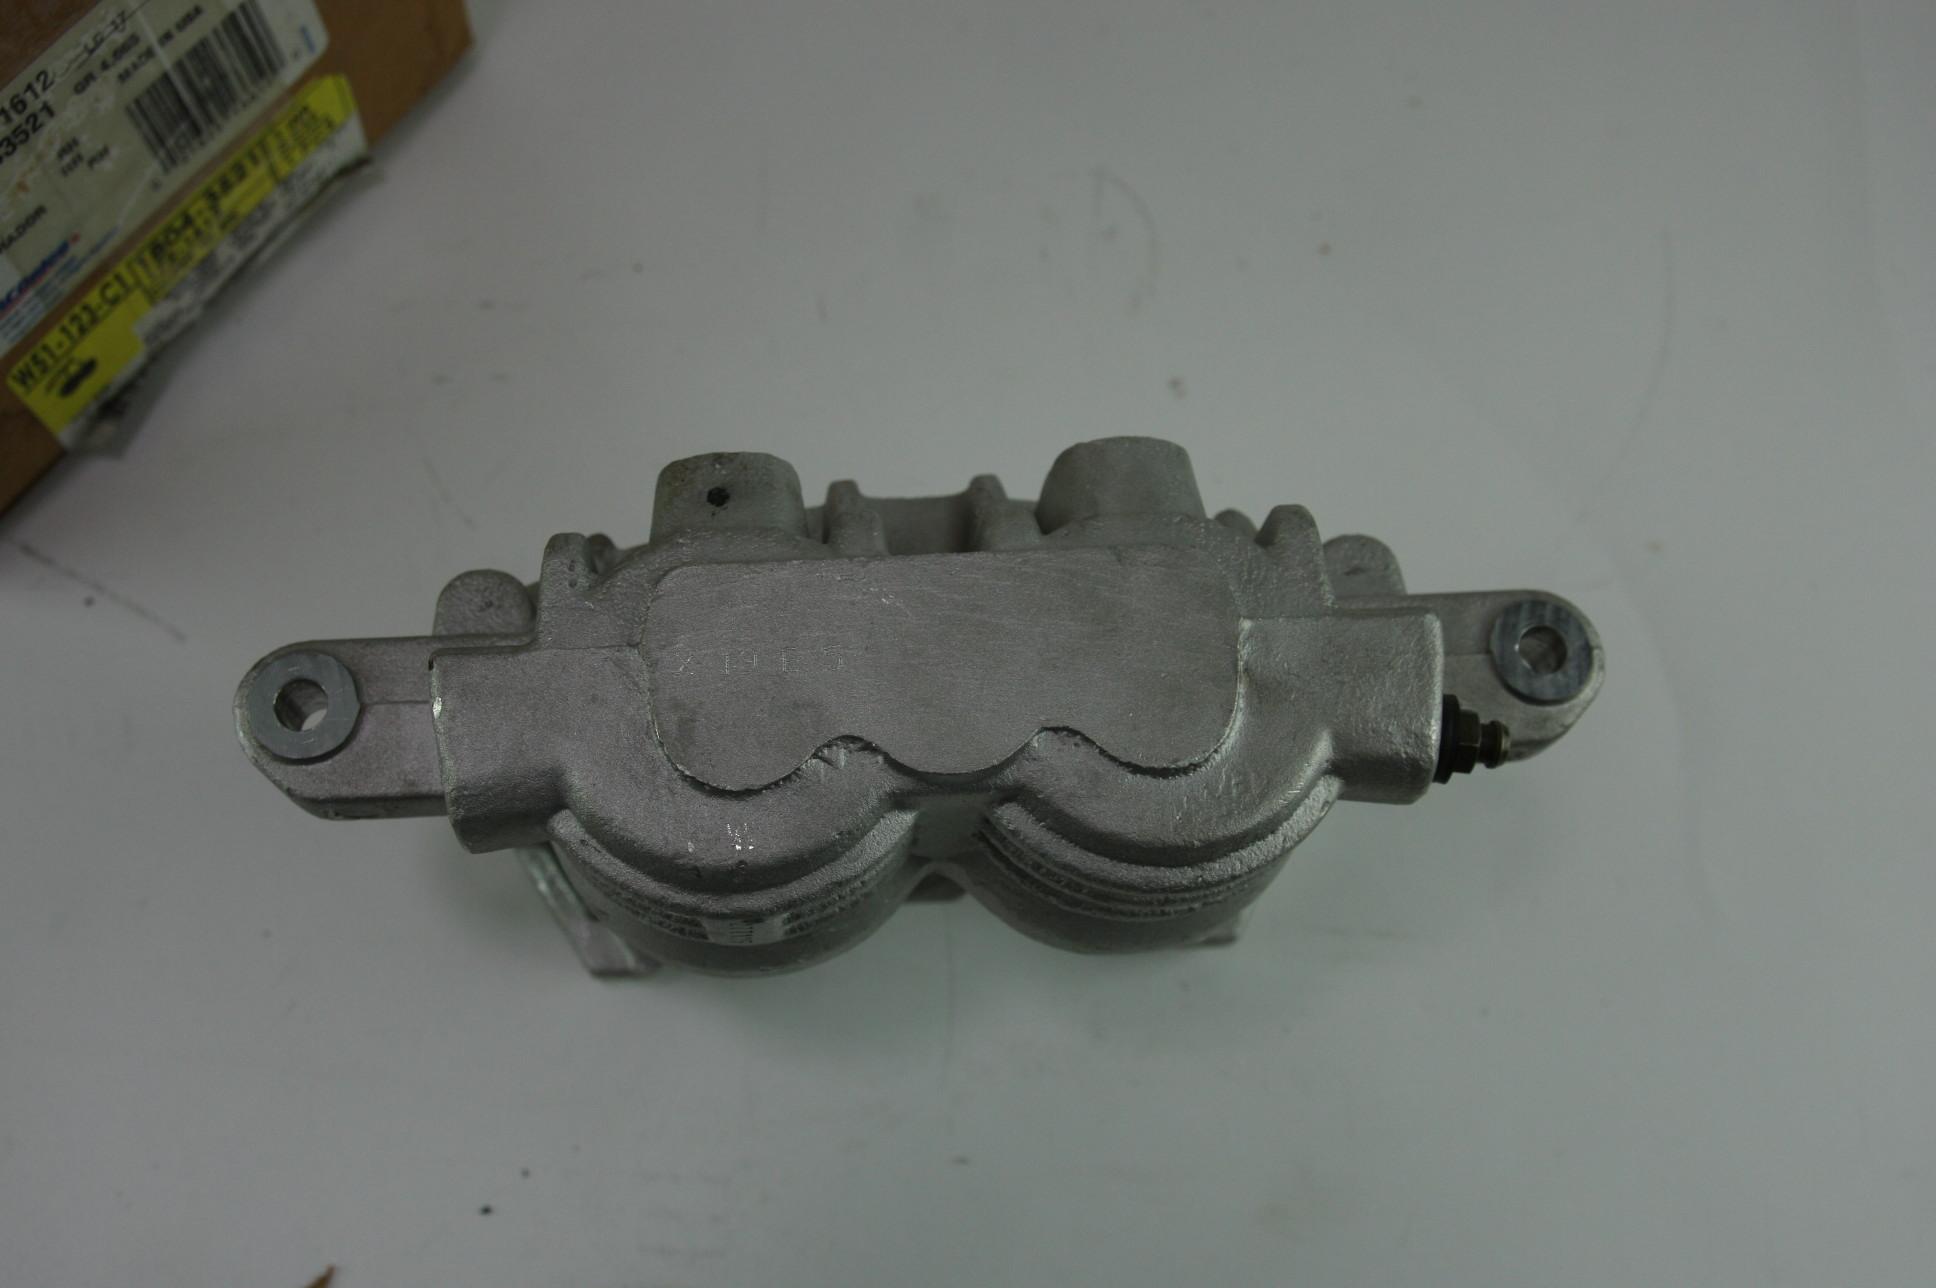 *** New Genuine OEM ACDelco 172-1612 GM 18043521 Disc Brake Caliper Rear Right - image 1